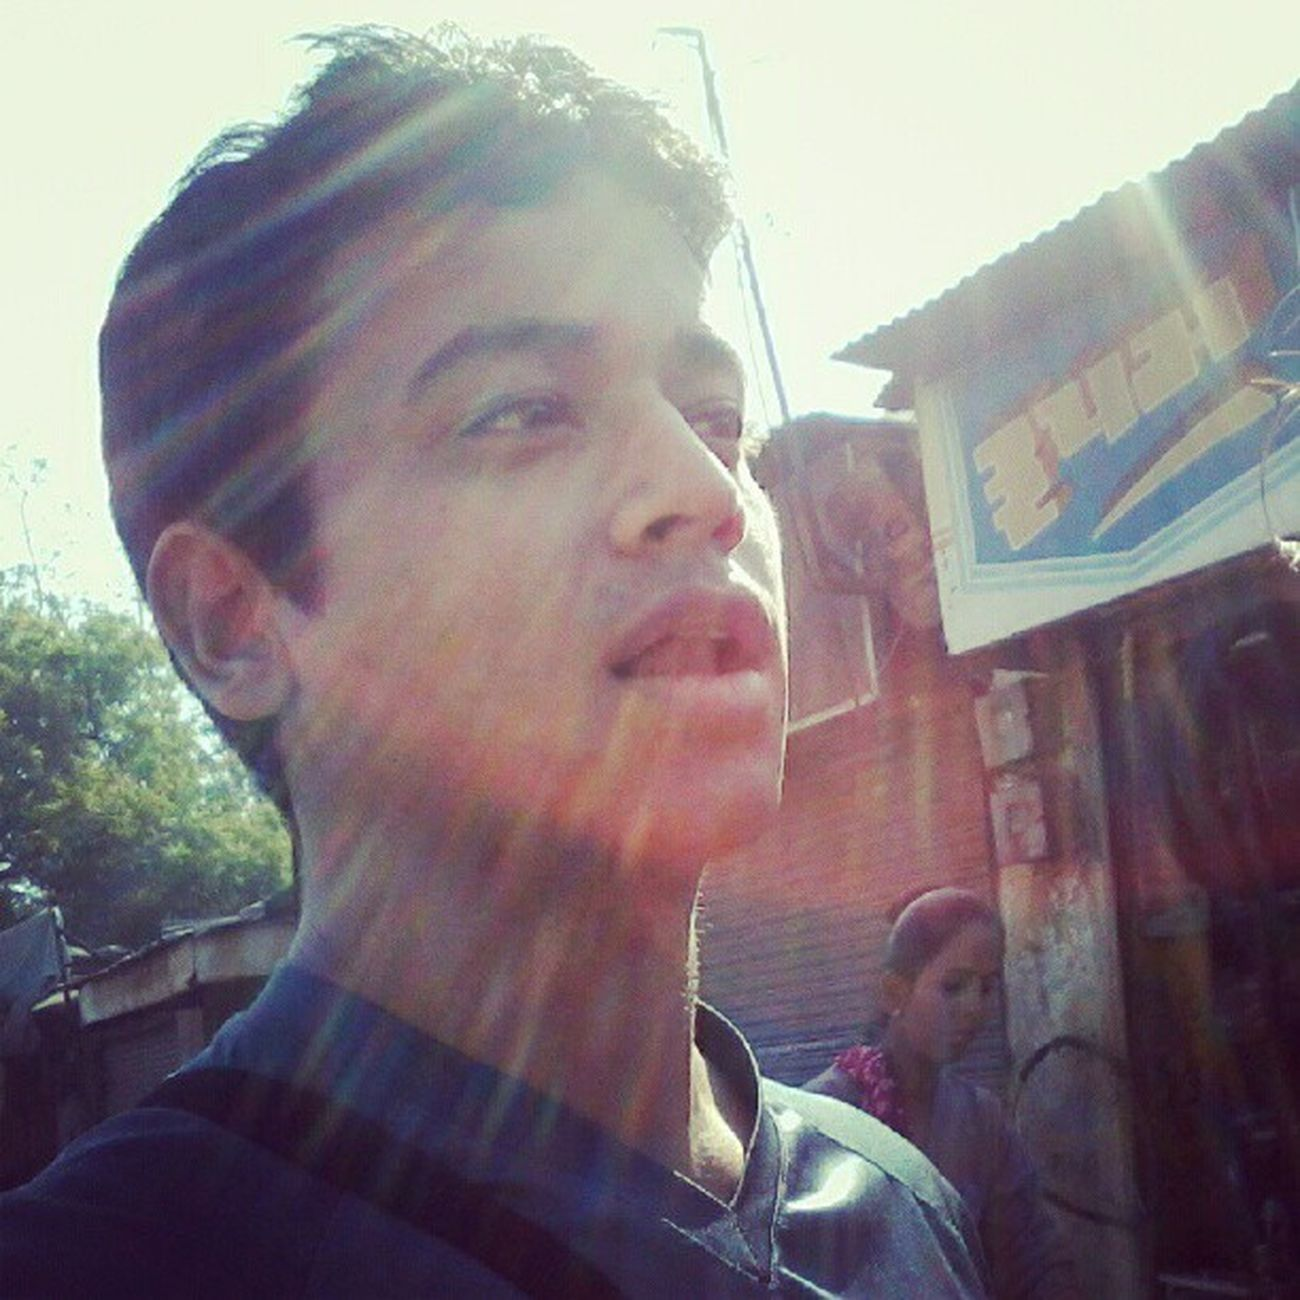 Sunshine Reflection Tagsforlikes Tagsforfollows Follows Likes India Instagram Instapic ShoutOut Glare Me